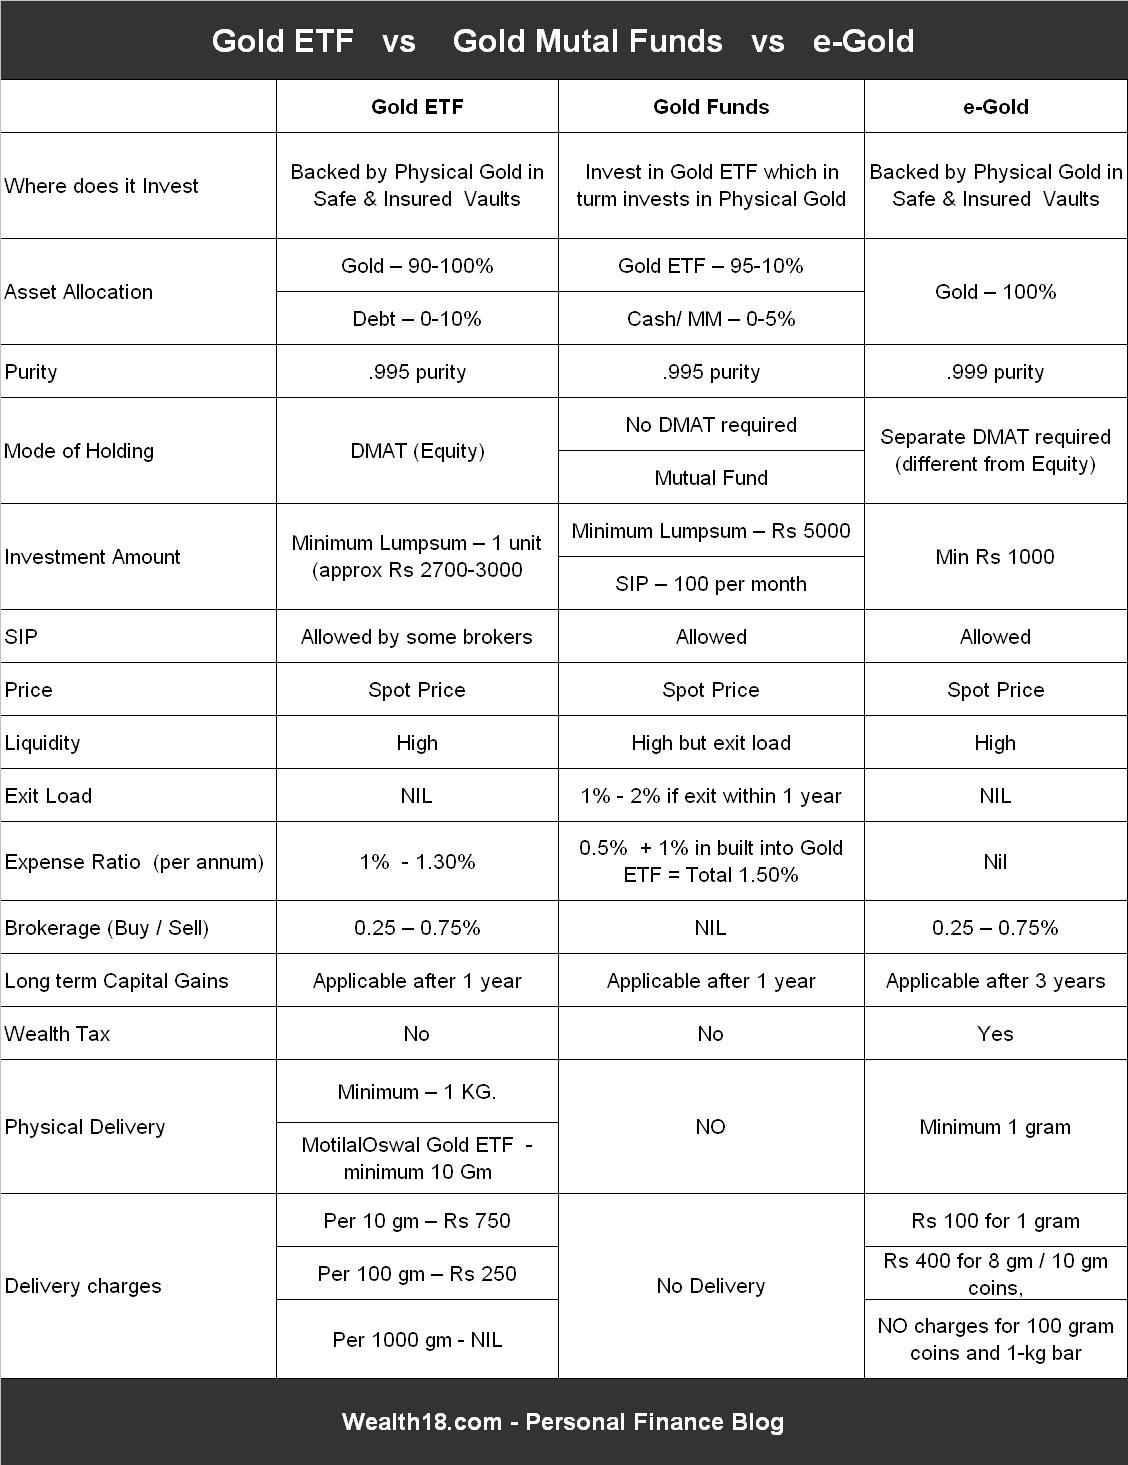 gold-etf-vs-gold-mutual-funds-vs-egold